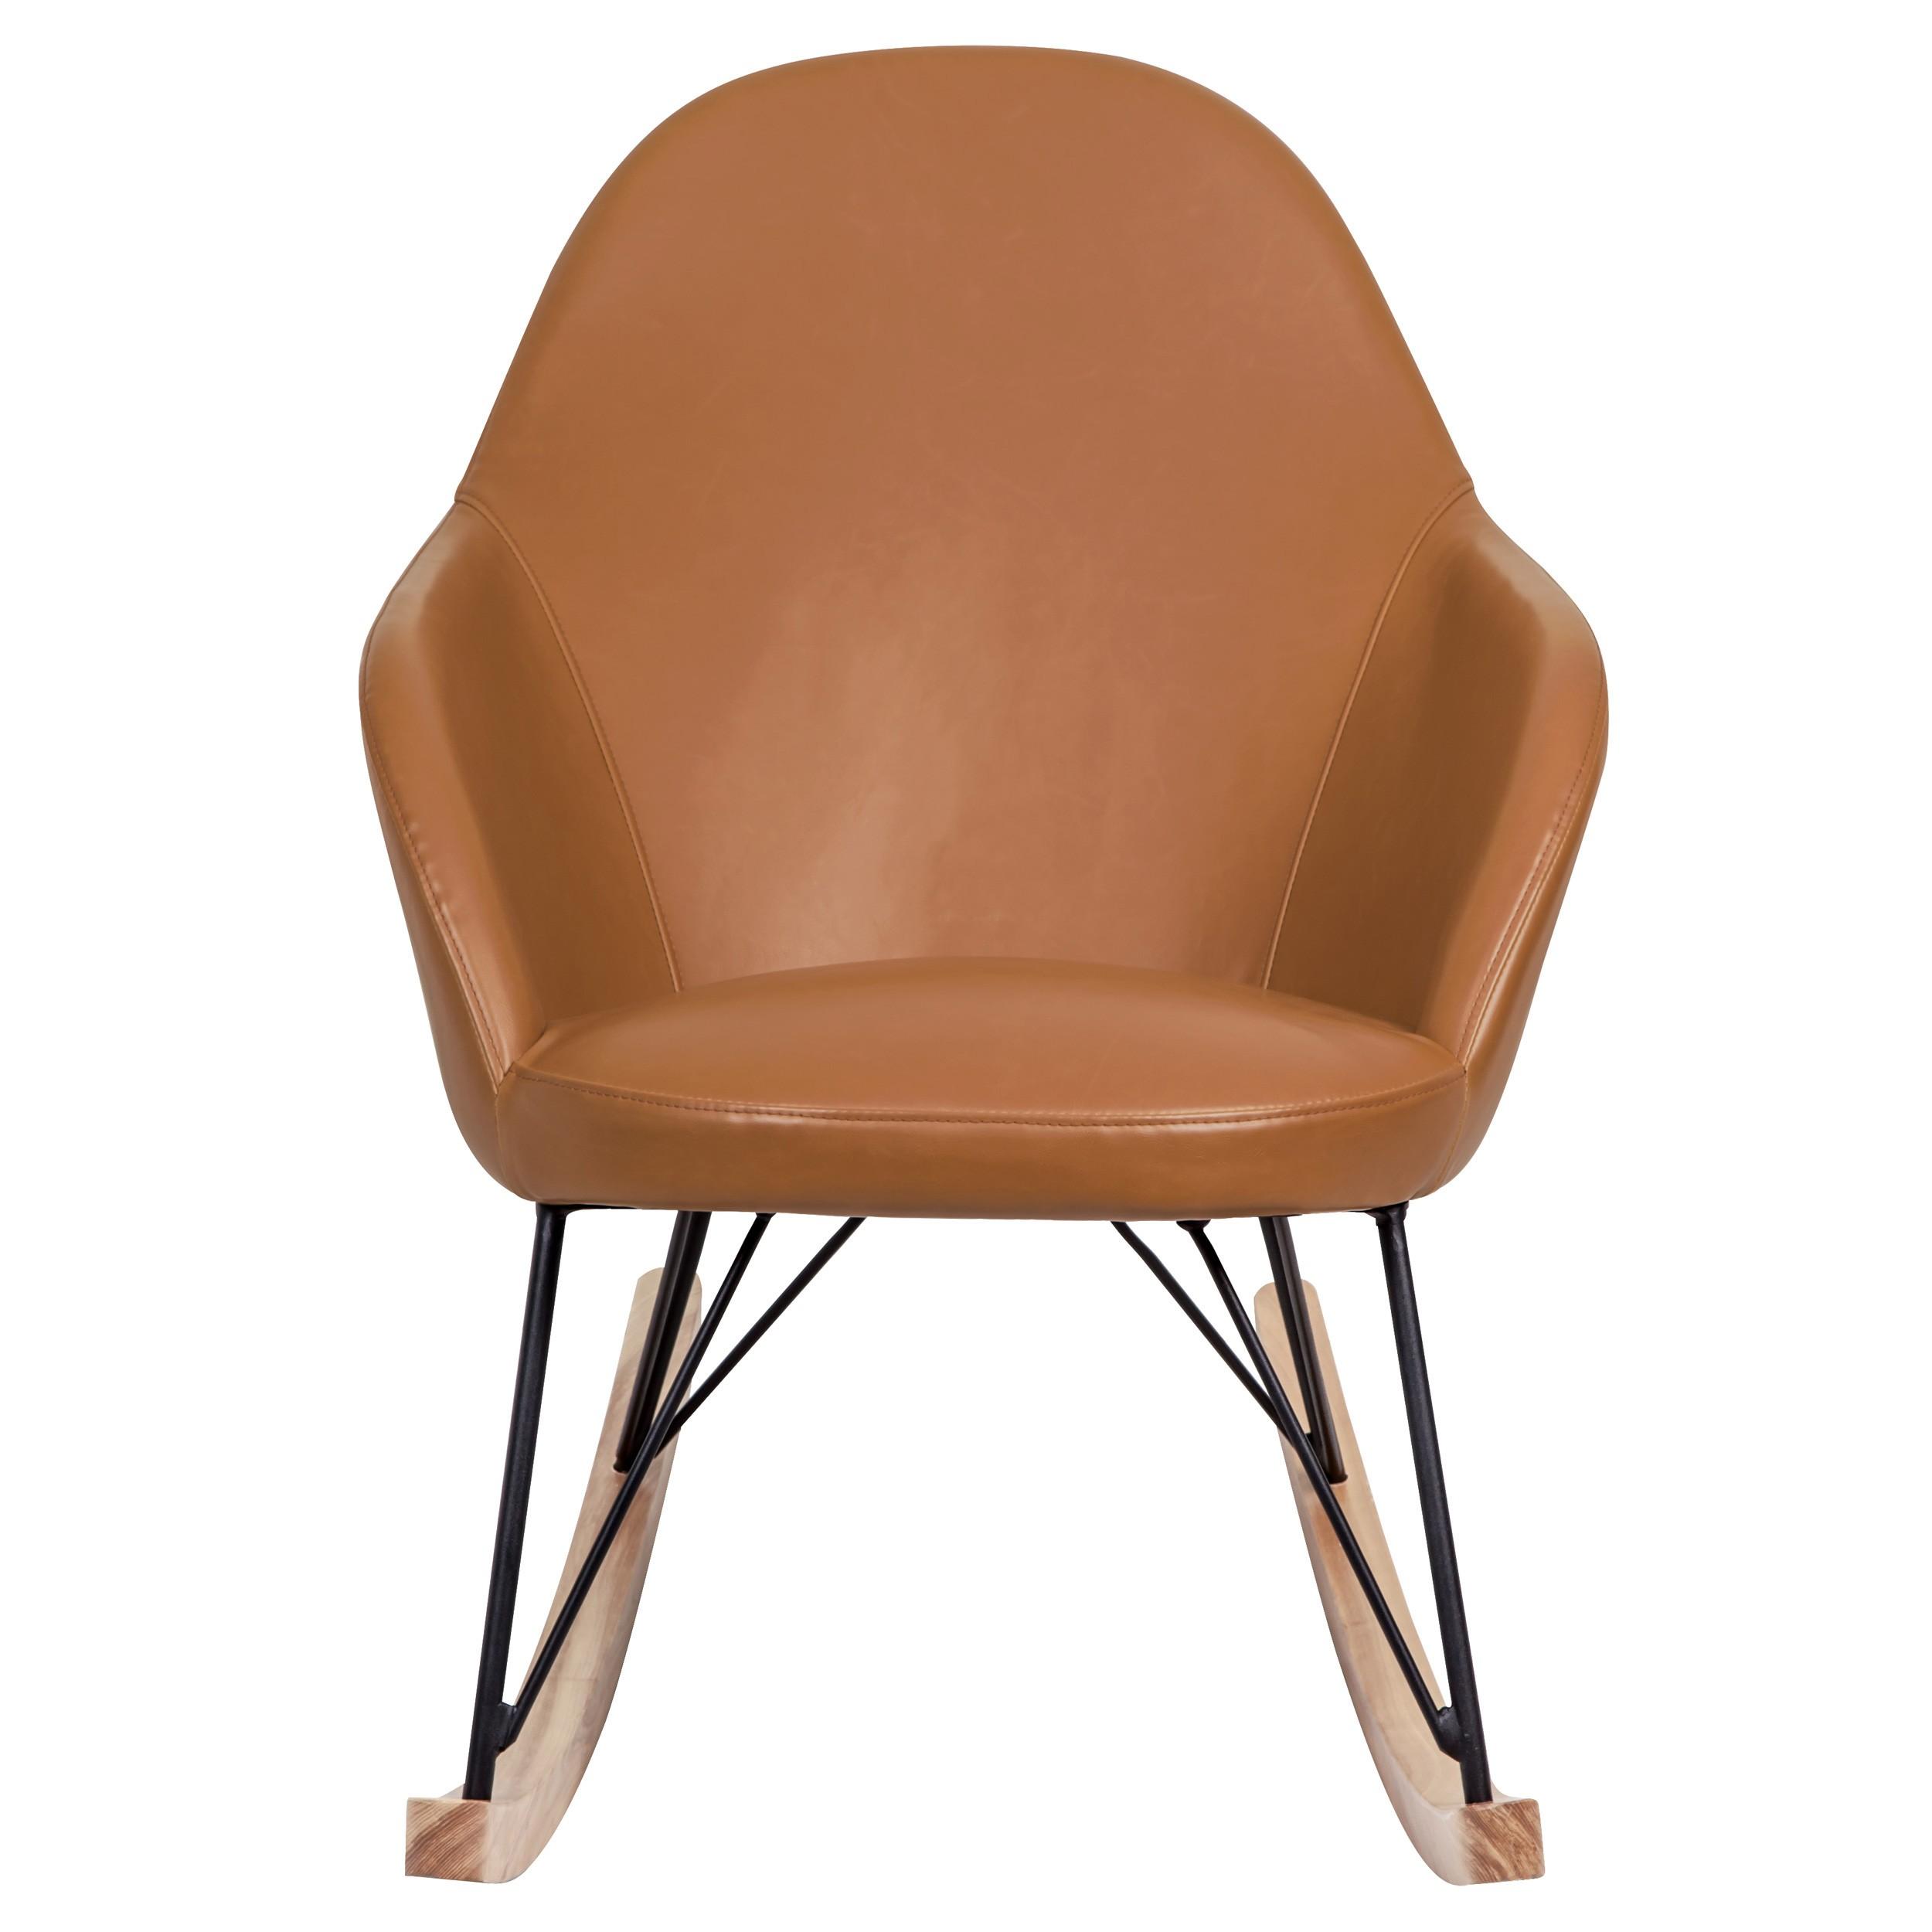 vente rocking chair fabulous replies retweet like with vente rocking chair affordable rocking. Black Bedroom Furniture Sets. Home Design Ideas